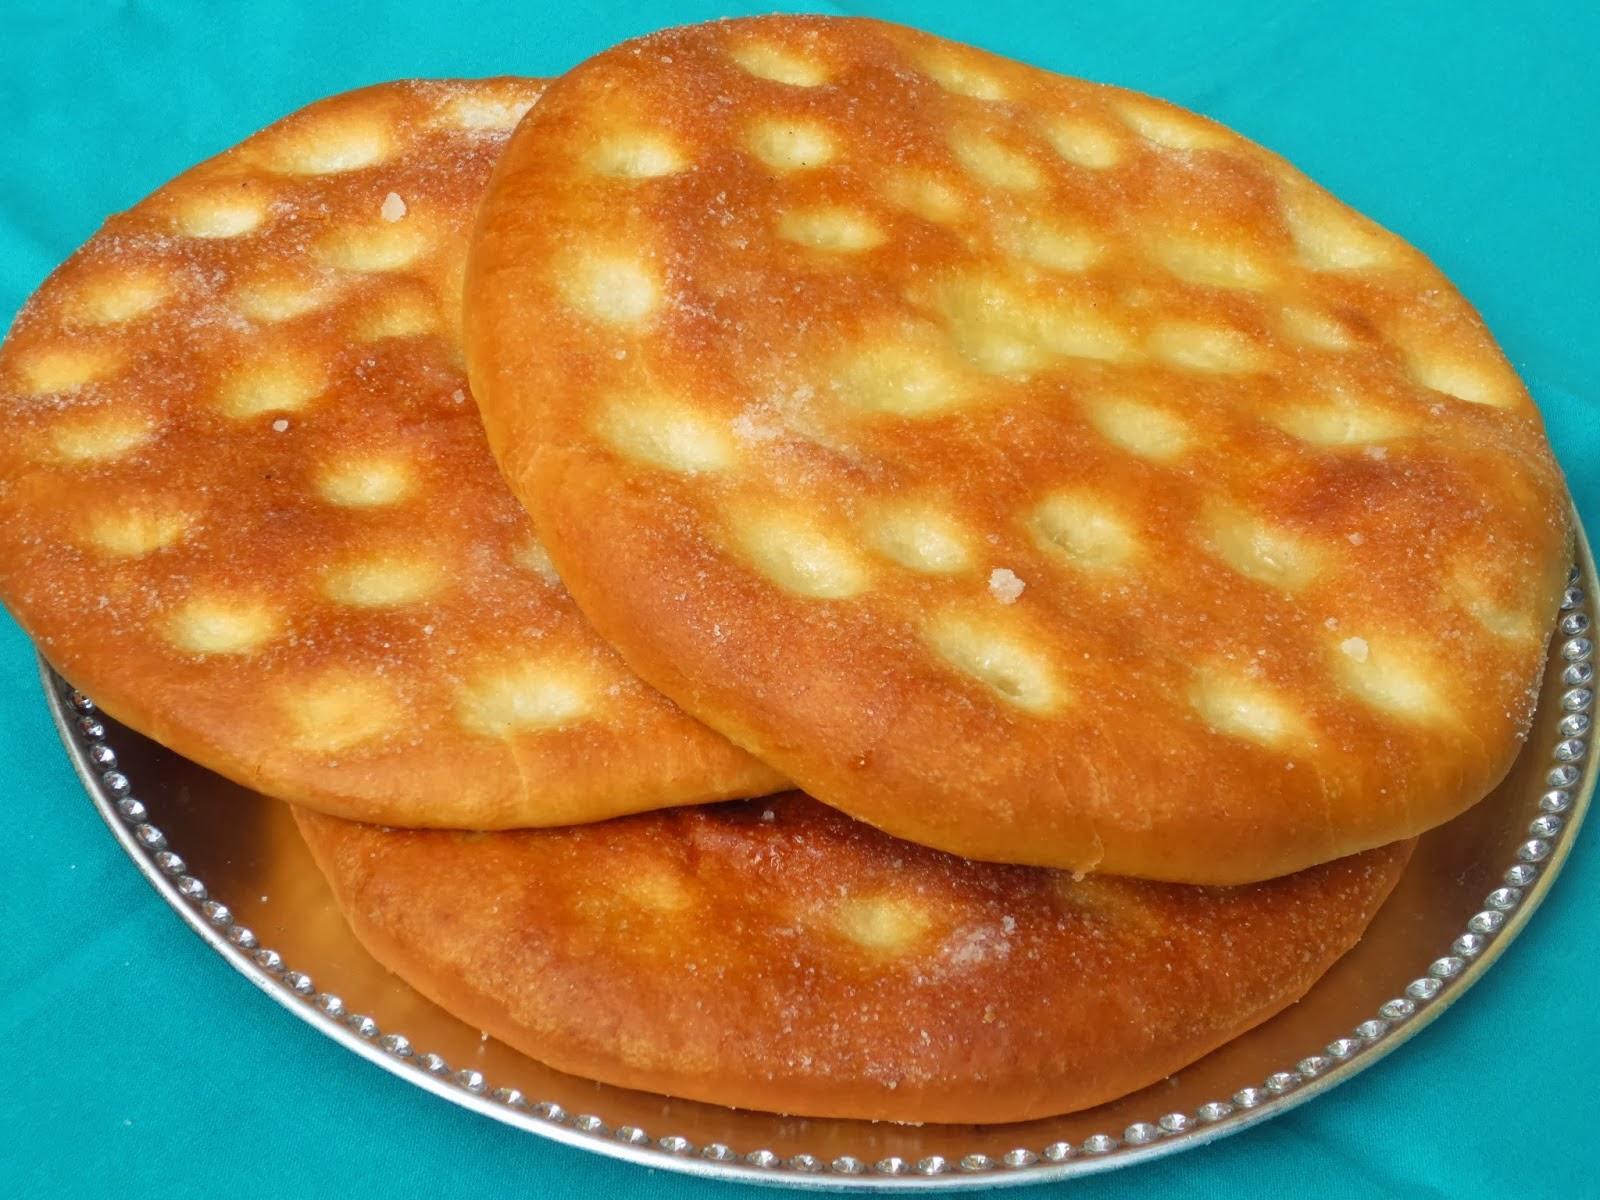 Tortas panaderas dulces con KitchenAid Ana Sevilla